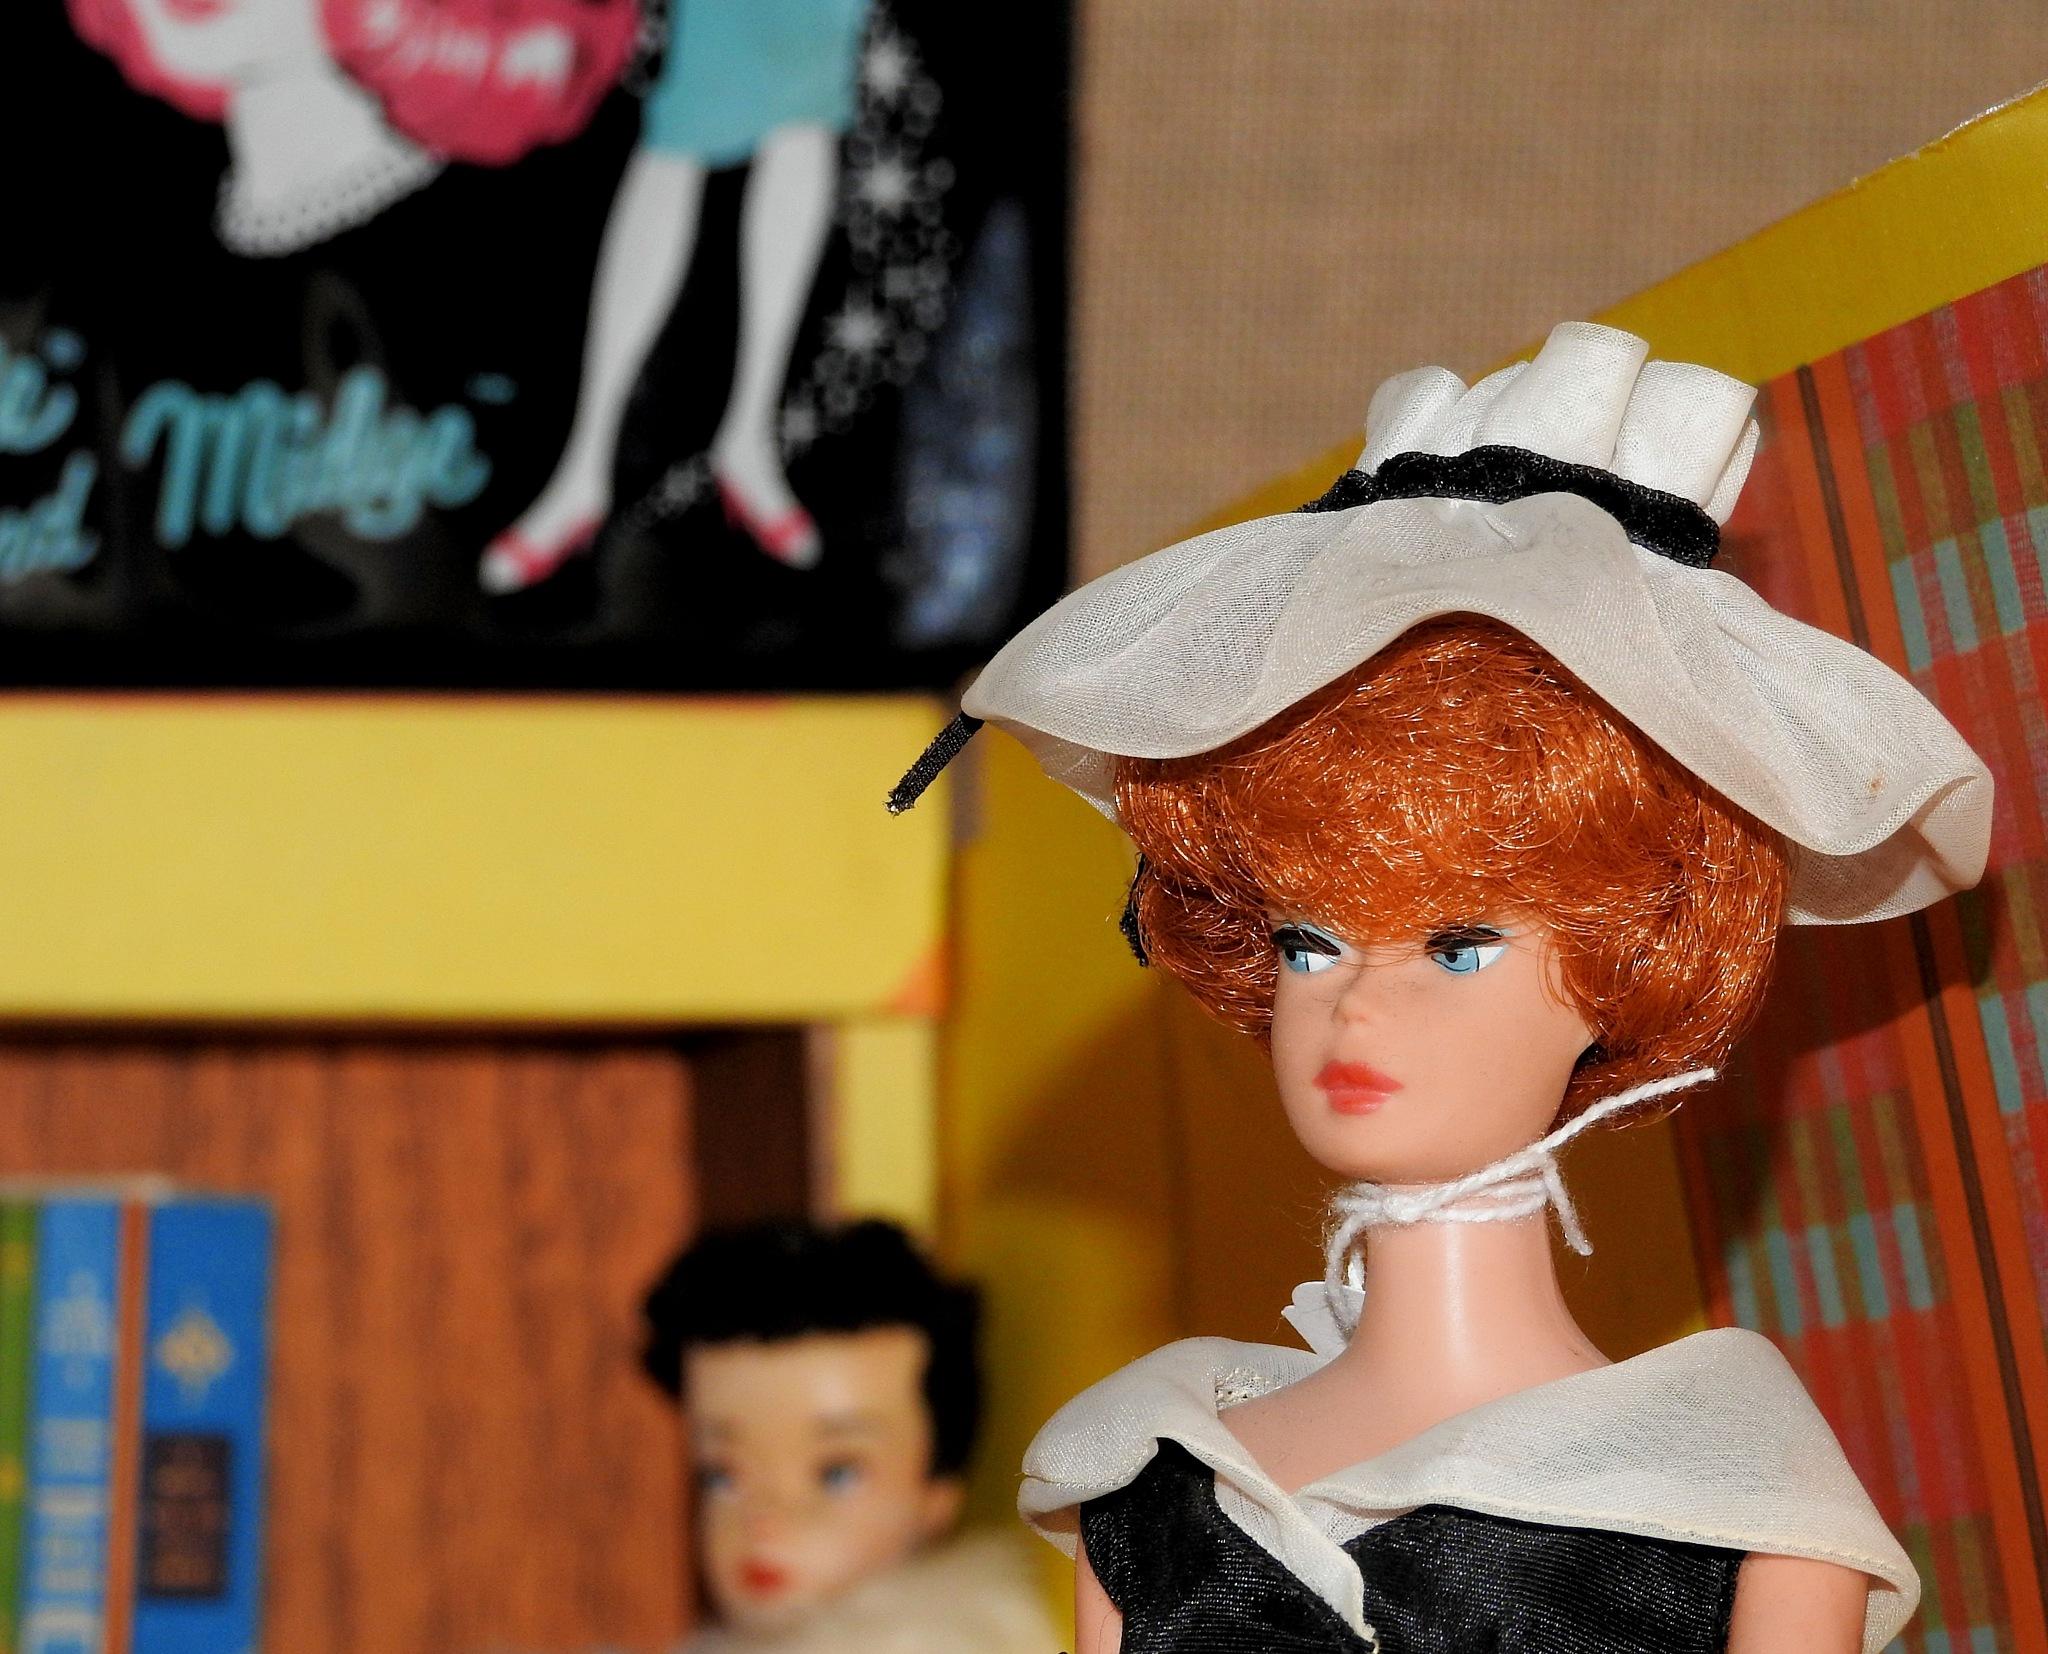 NAPOLI - STORIE DI GIOCATTOLI DAL SETTECENTO A BARBIE - Happy Day, Barbie's Family! - 3 by Arnaldo De Lisio